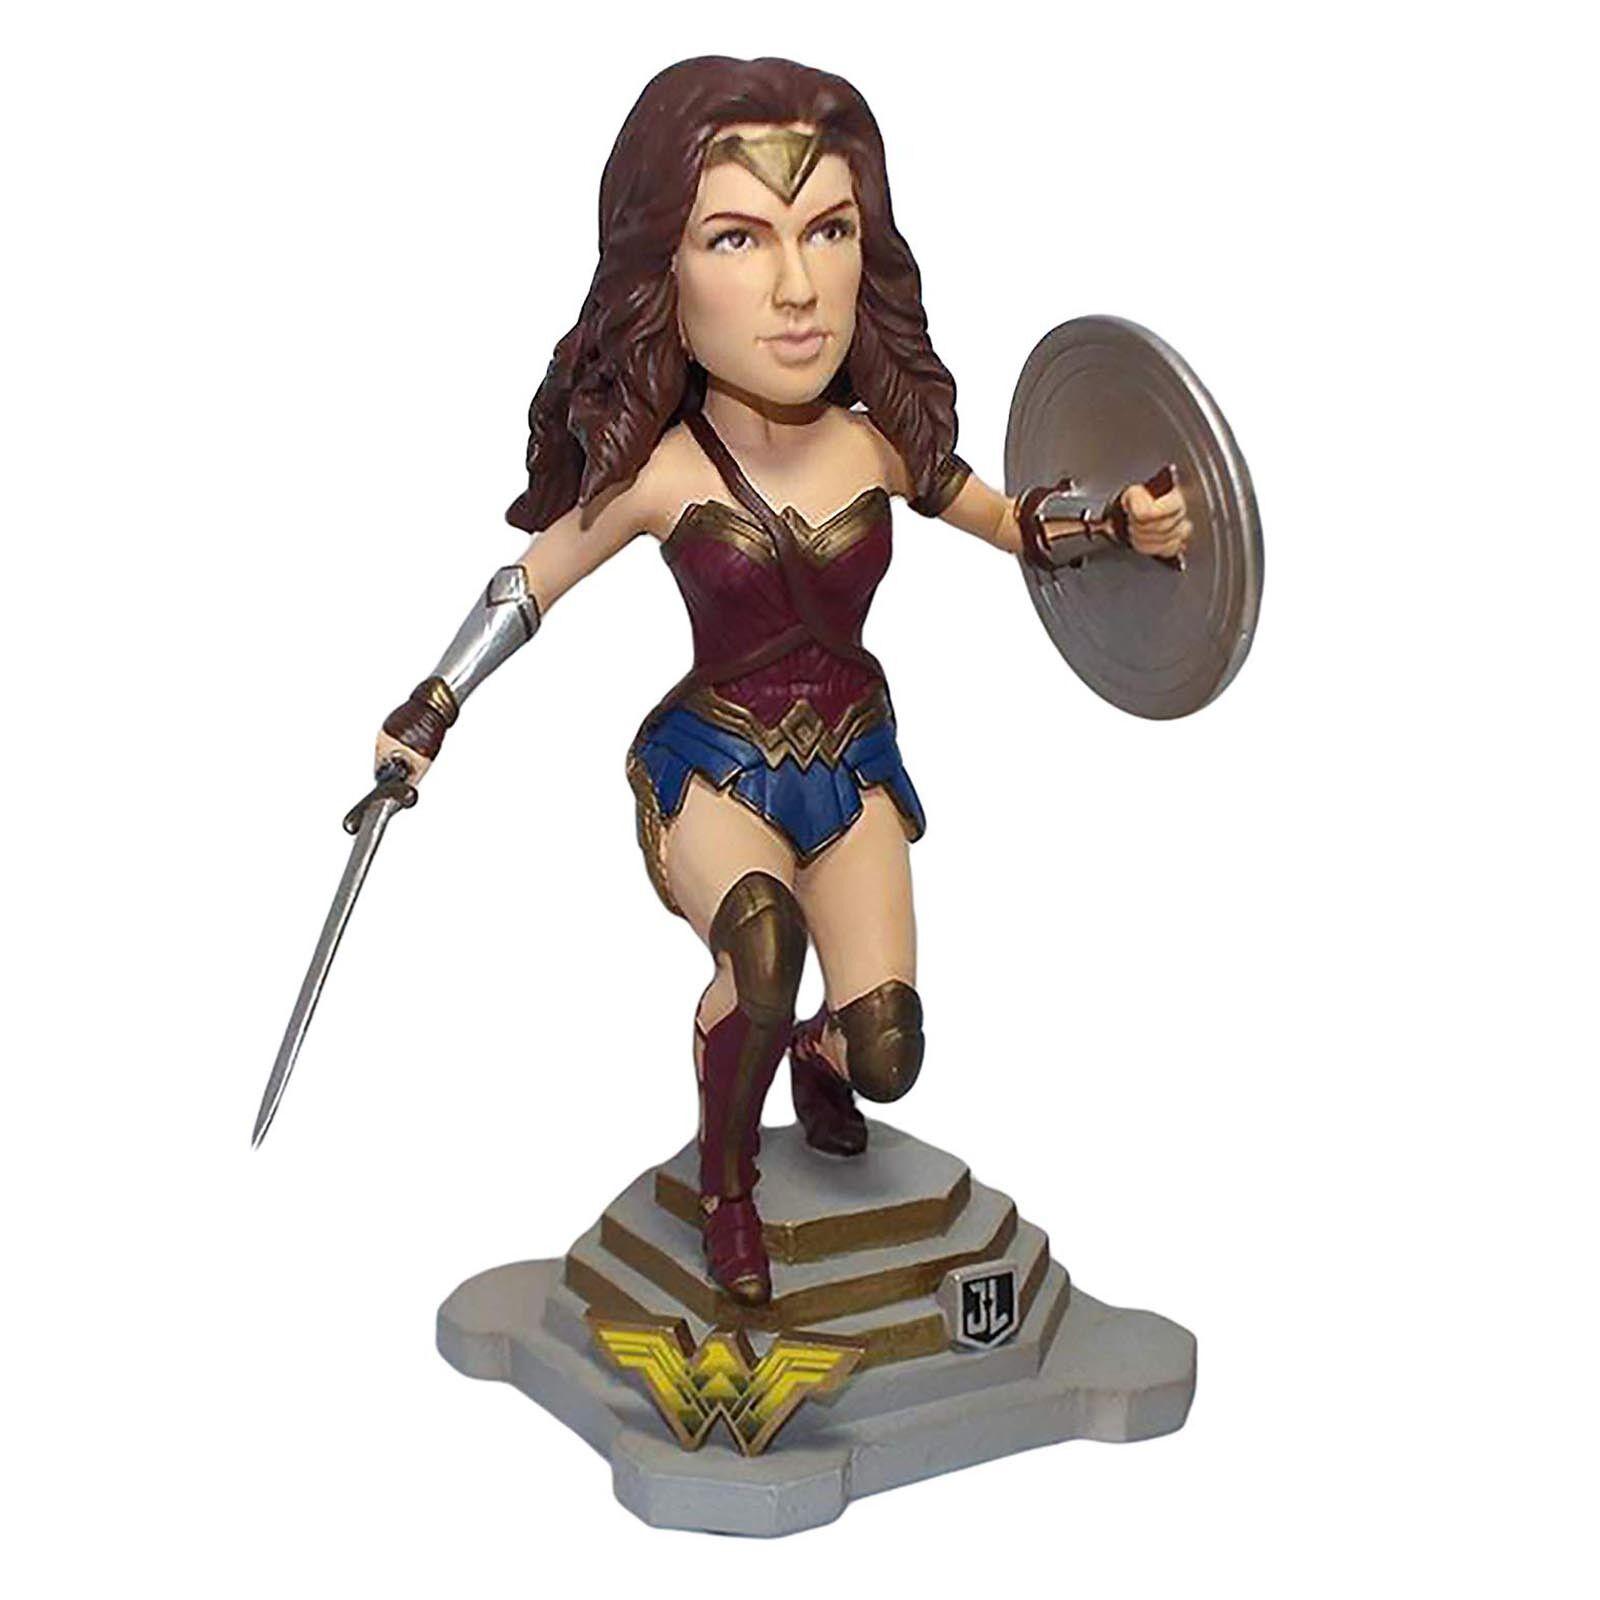 FOCO DC Justice League Wonder kvinna Bobble Head Figur NY leksaker samlaives